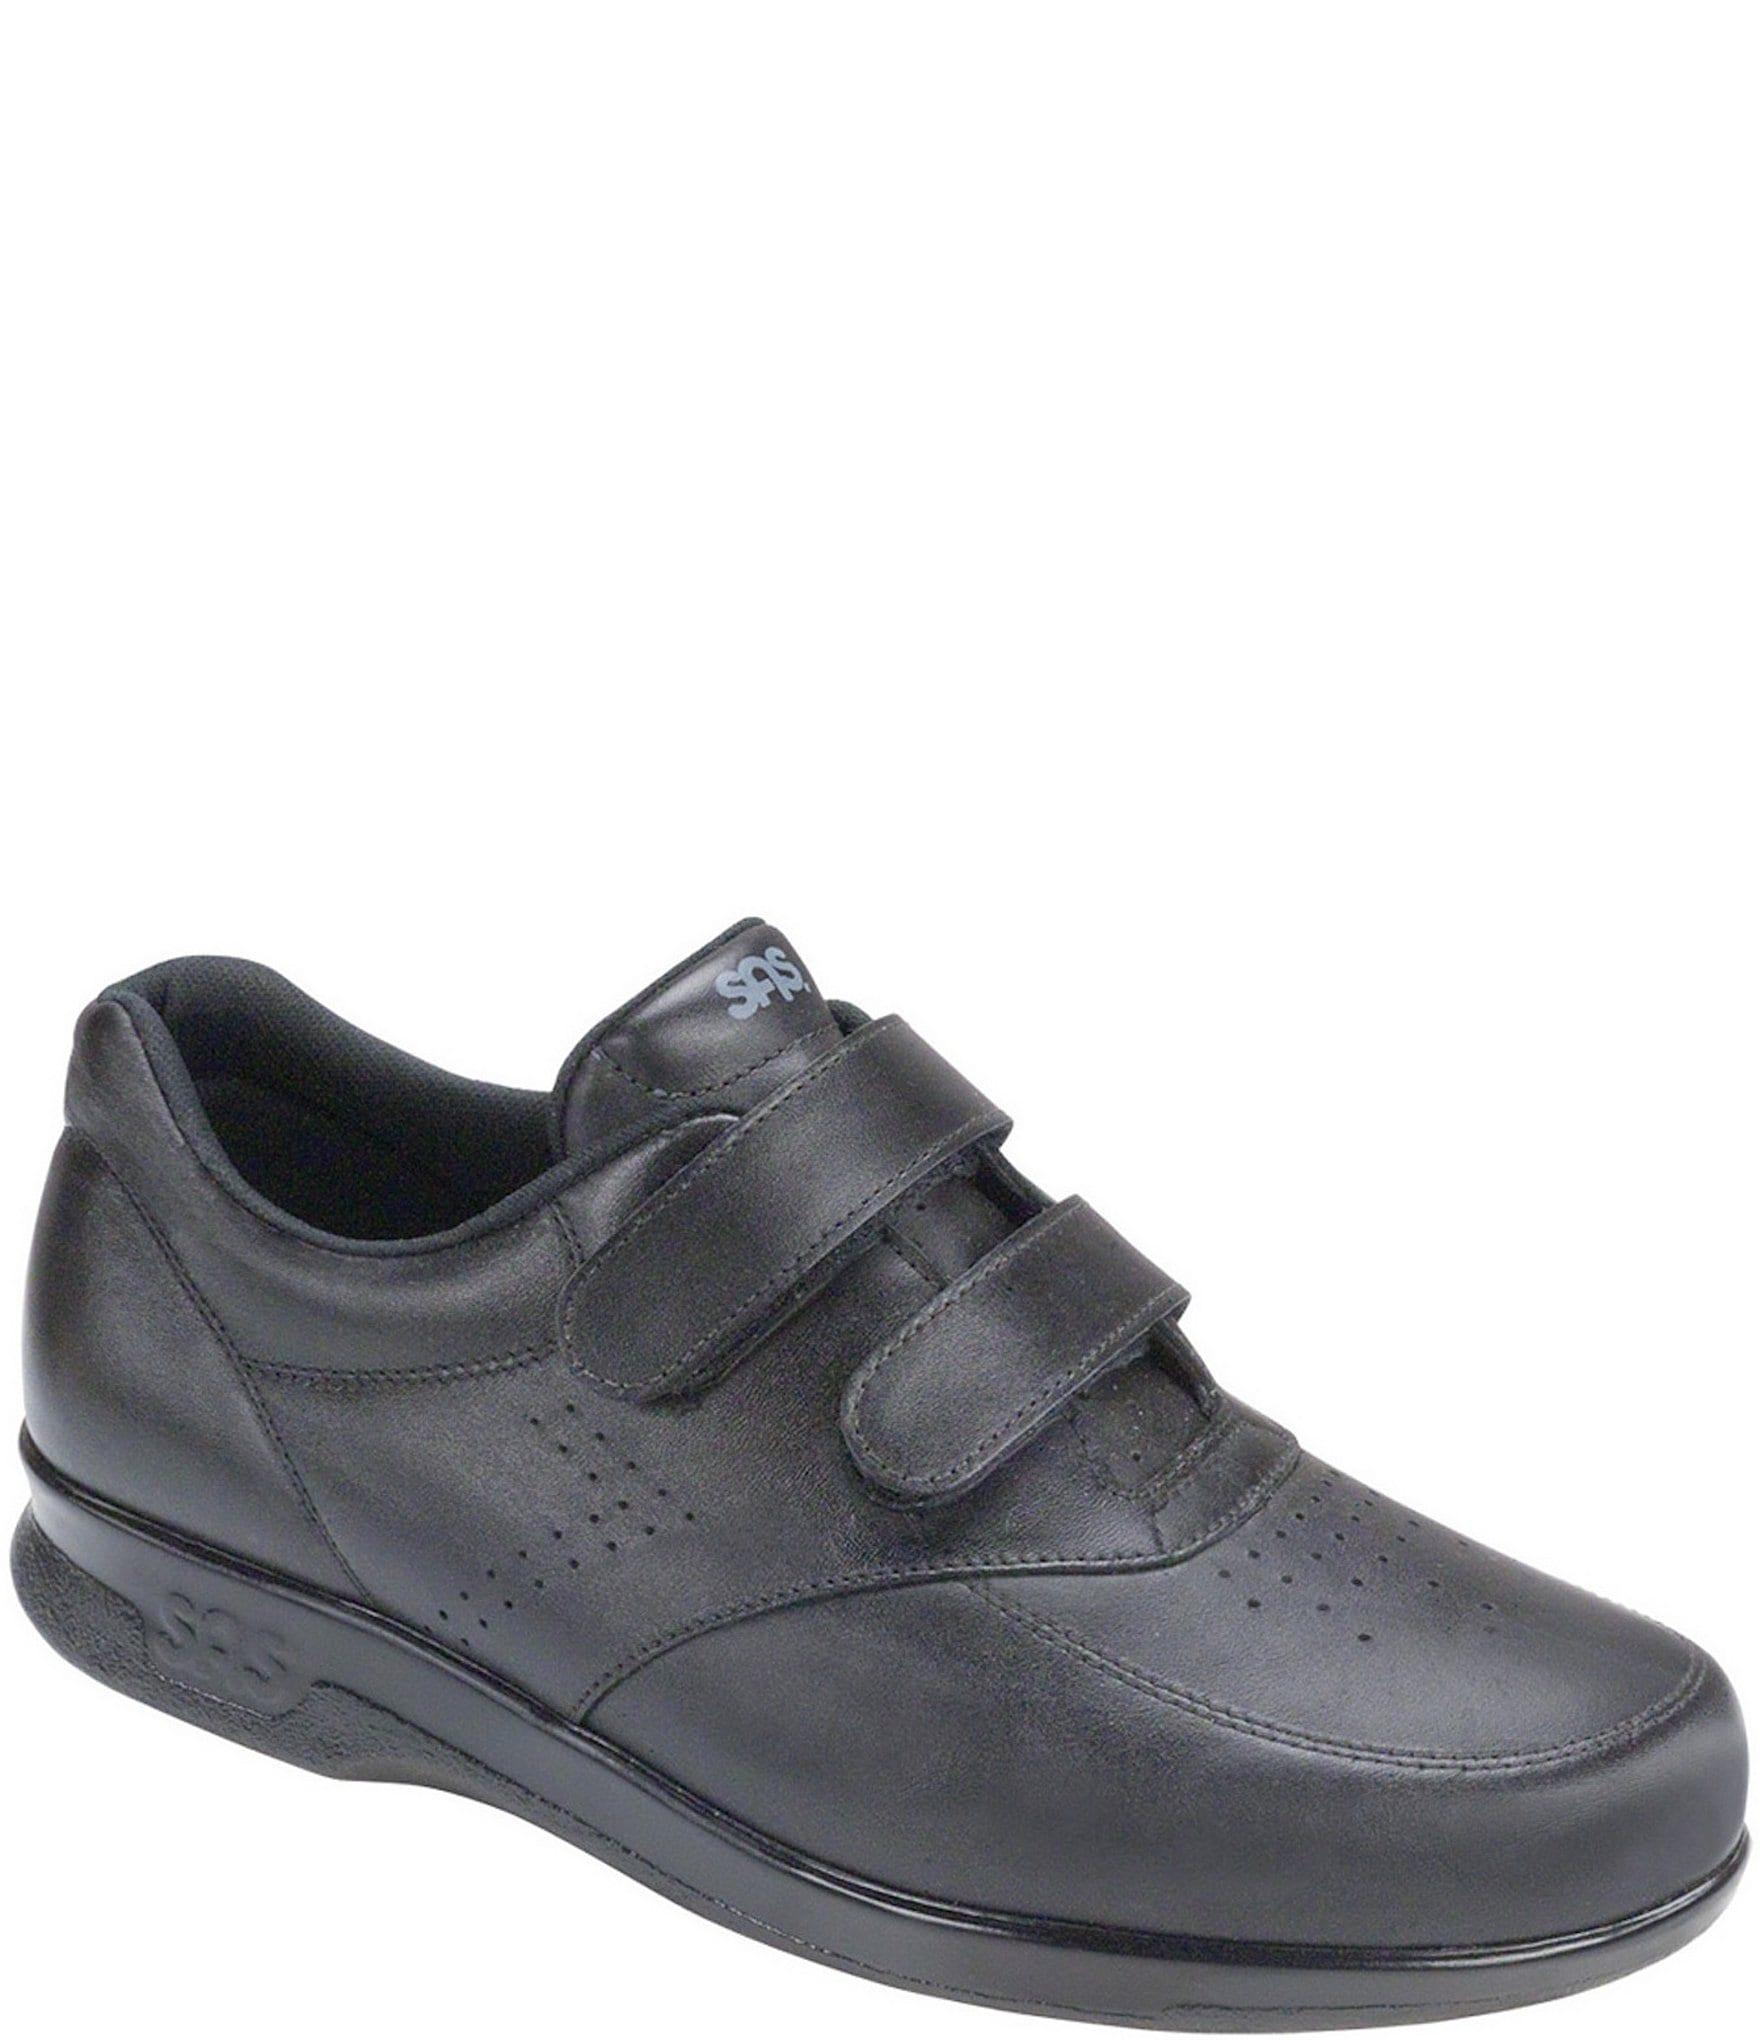 SAS Men's VTO Walking Shoes | Dillard's